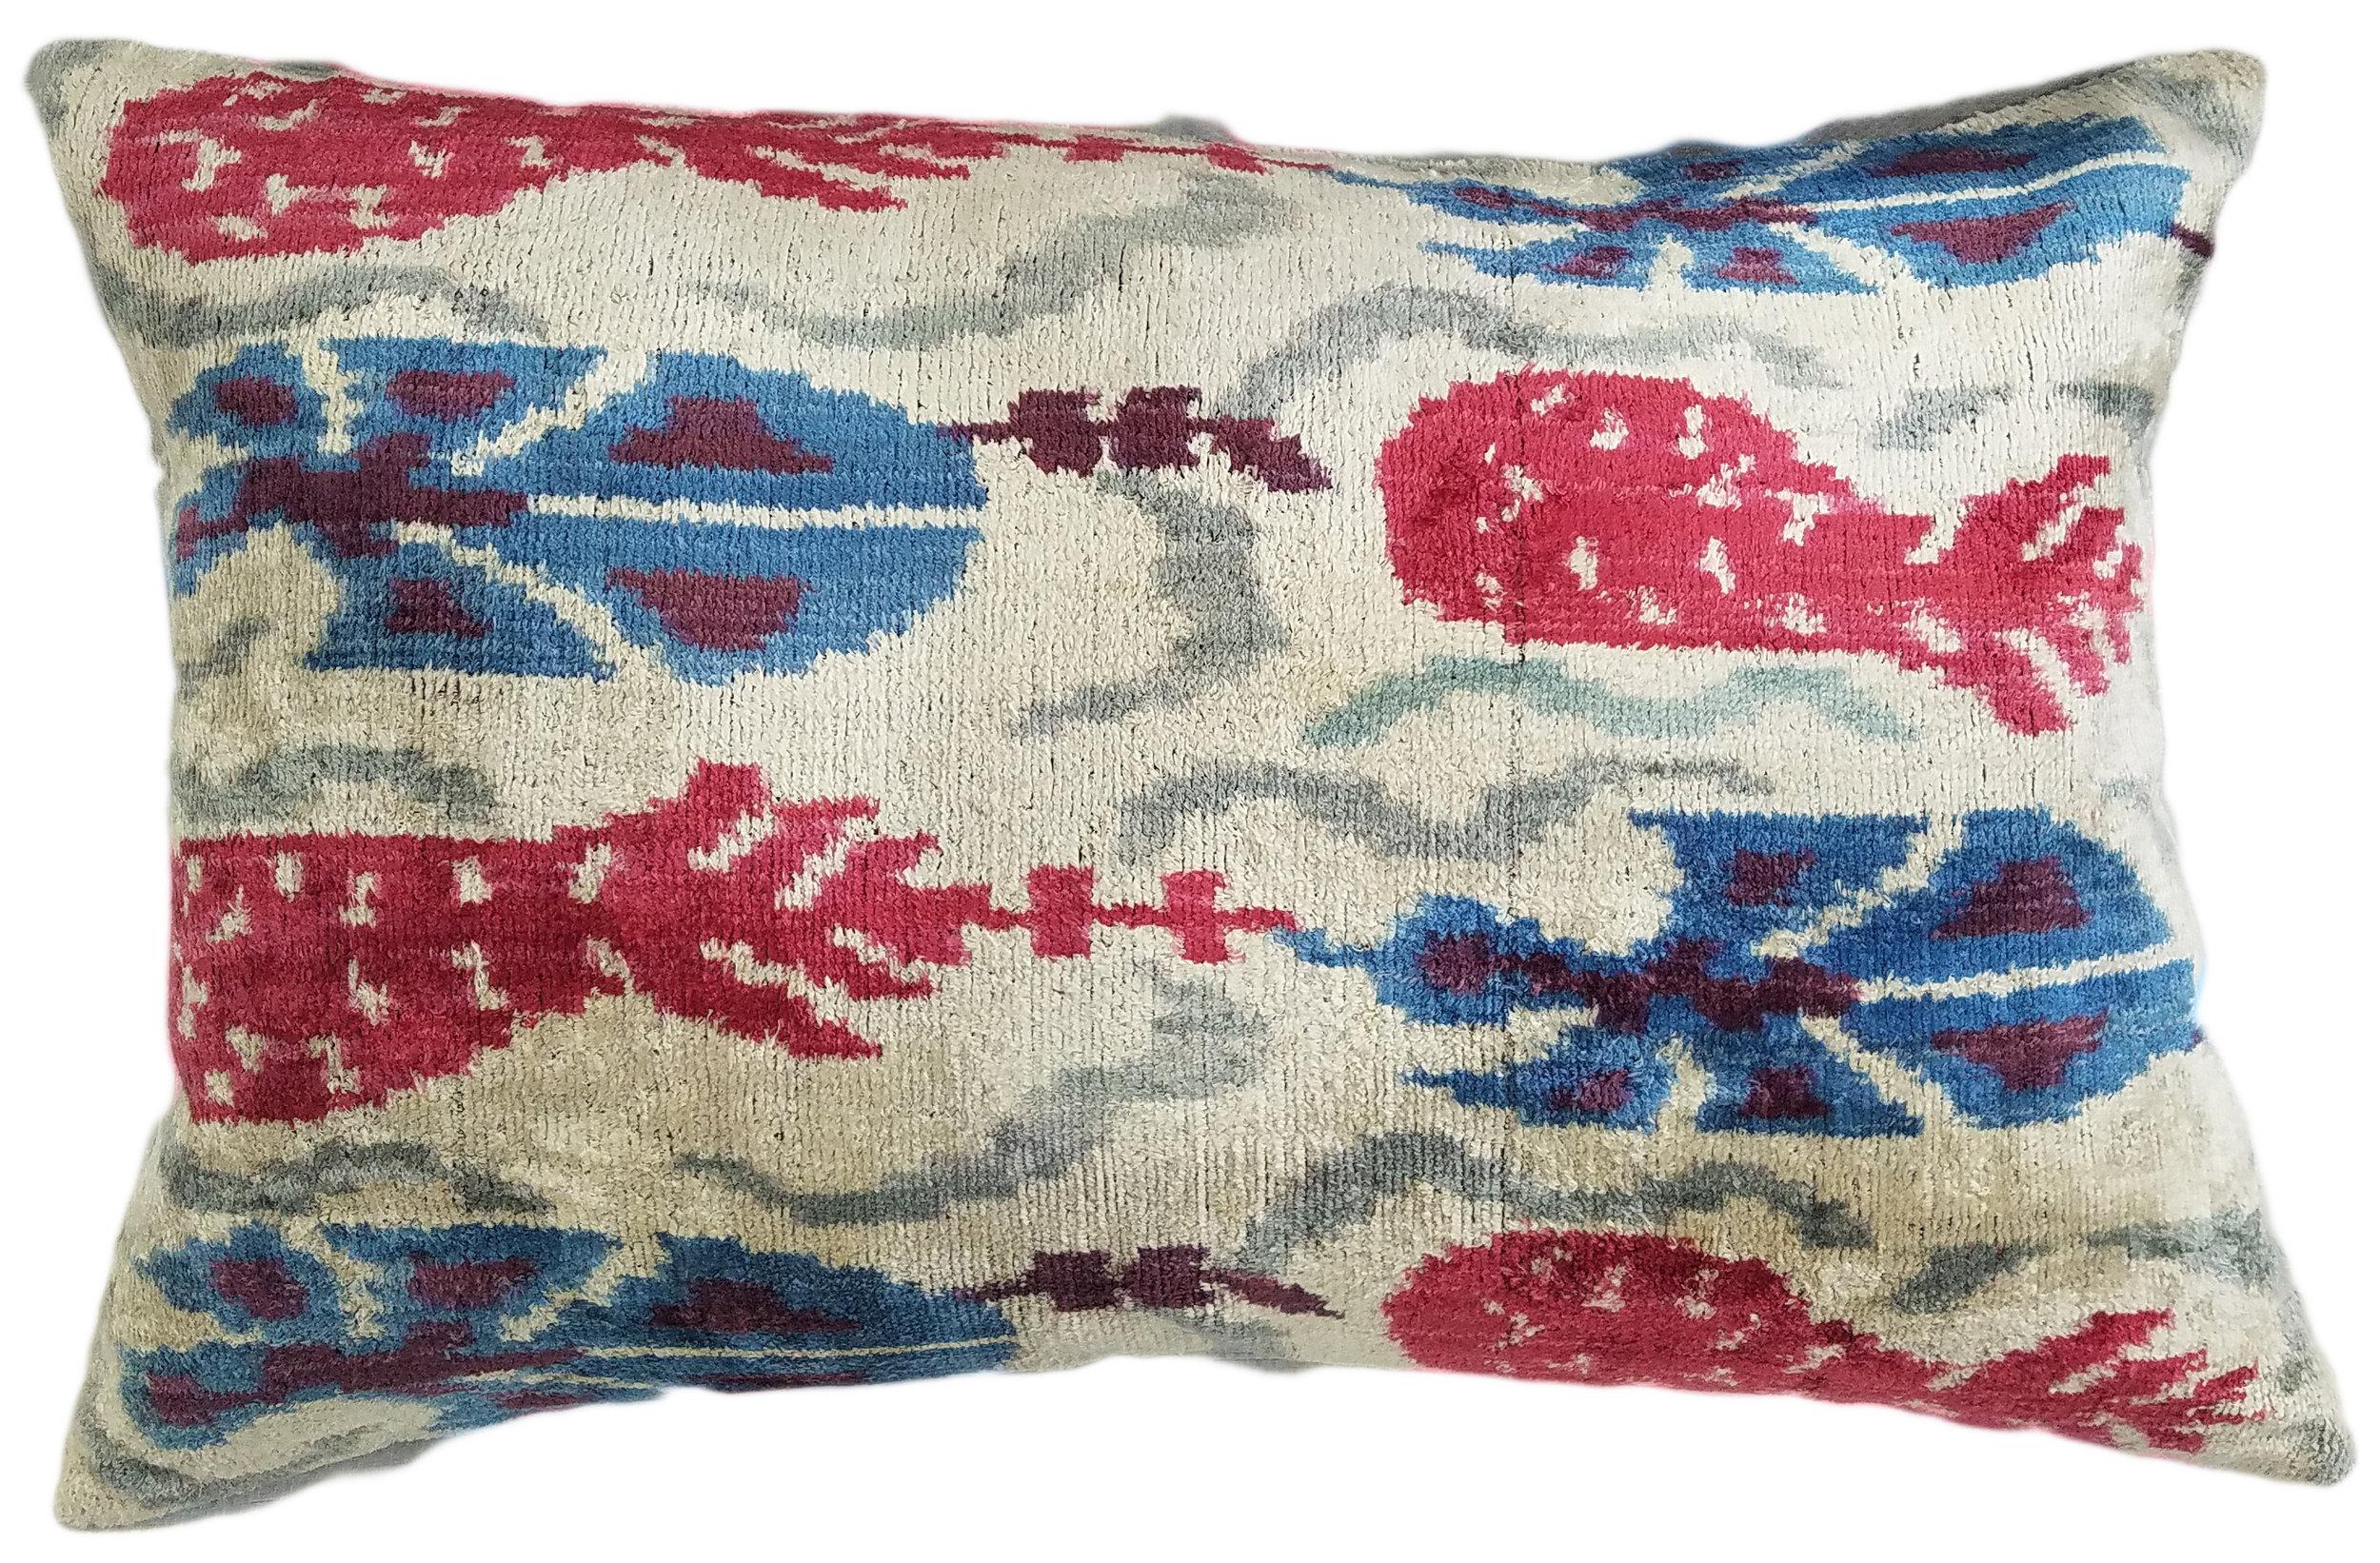 silk velvet pillow cover 16 x 24 felicity sargent design